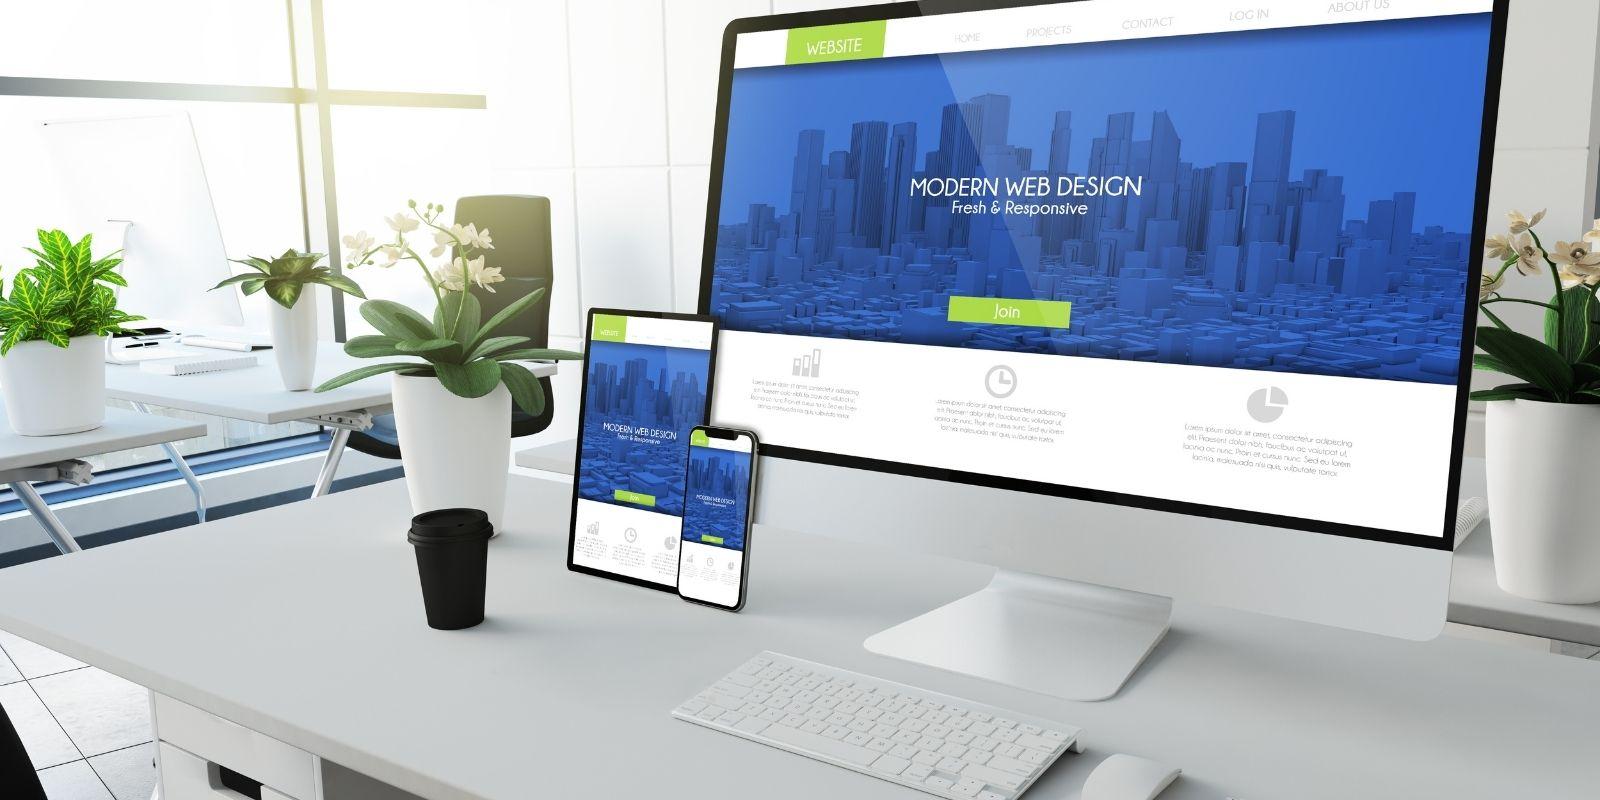 small-business-website-design-orion-marketing